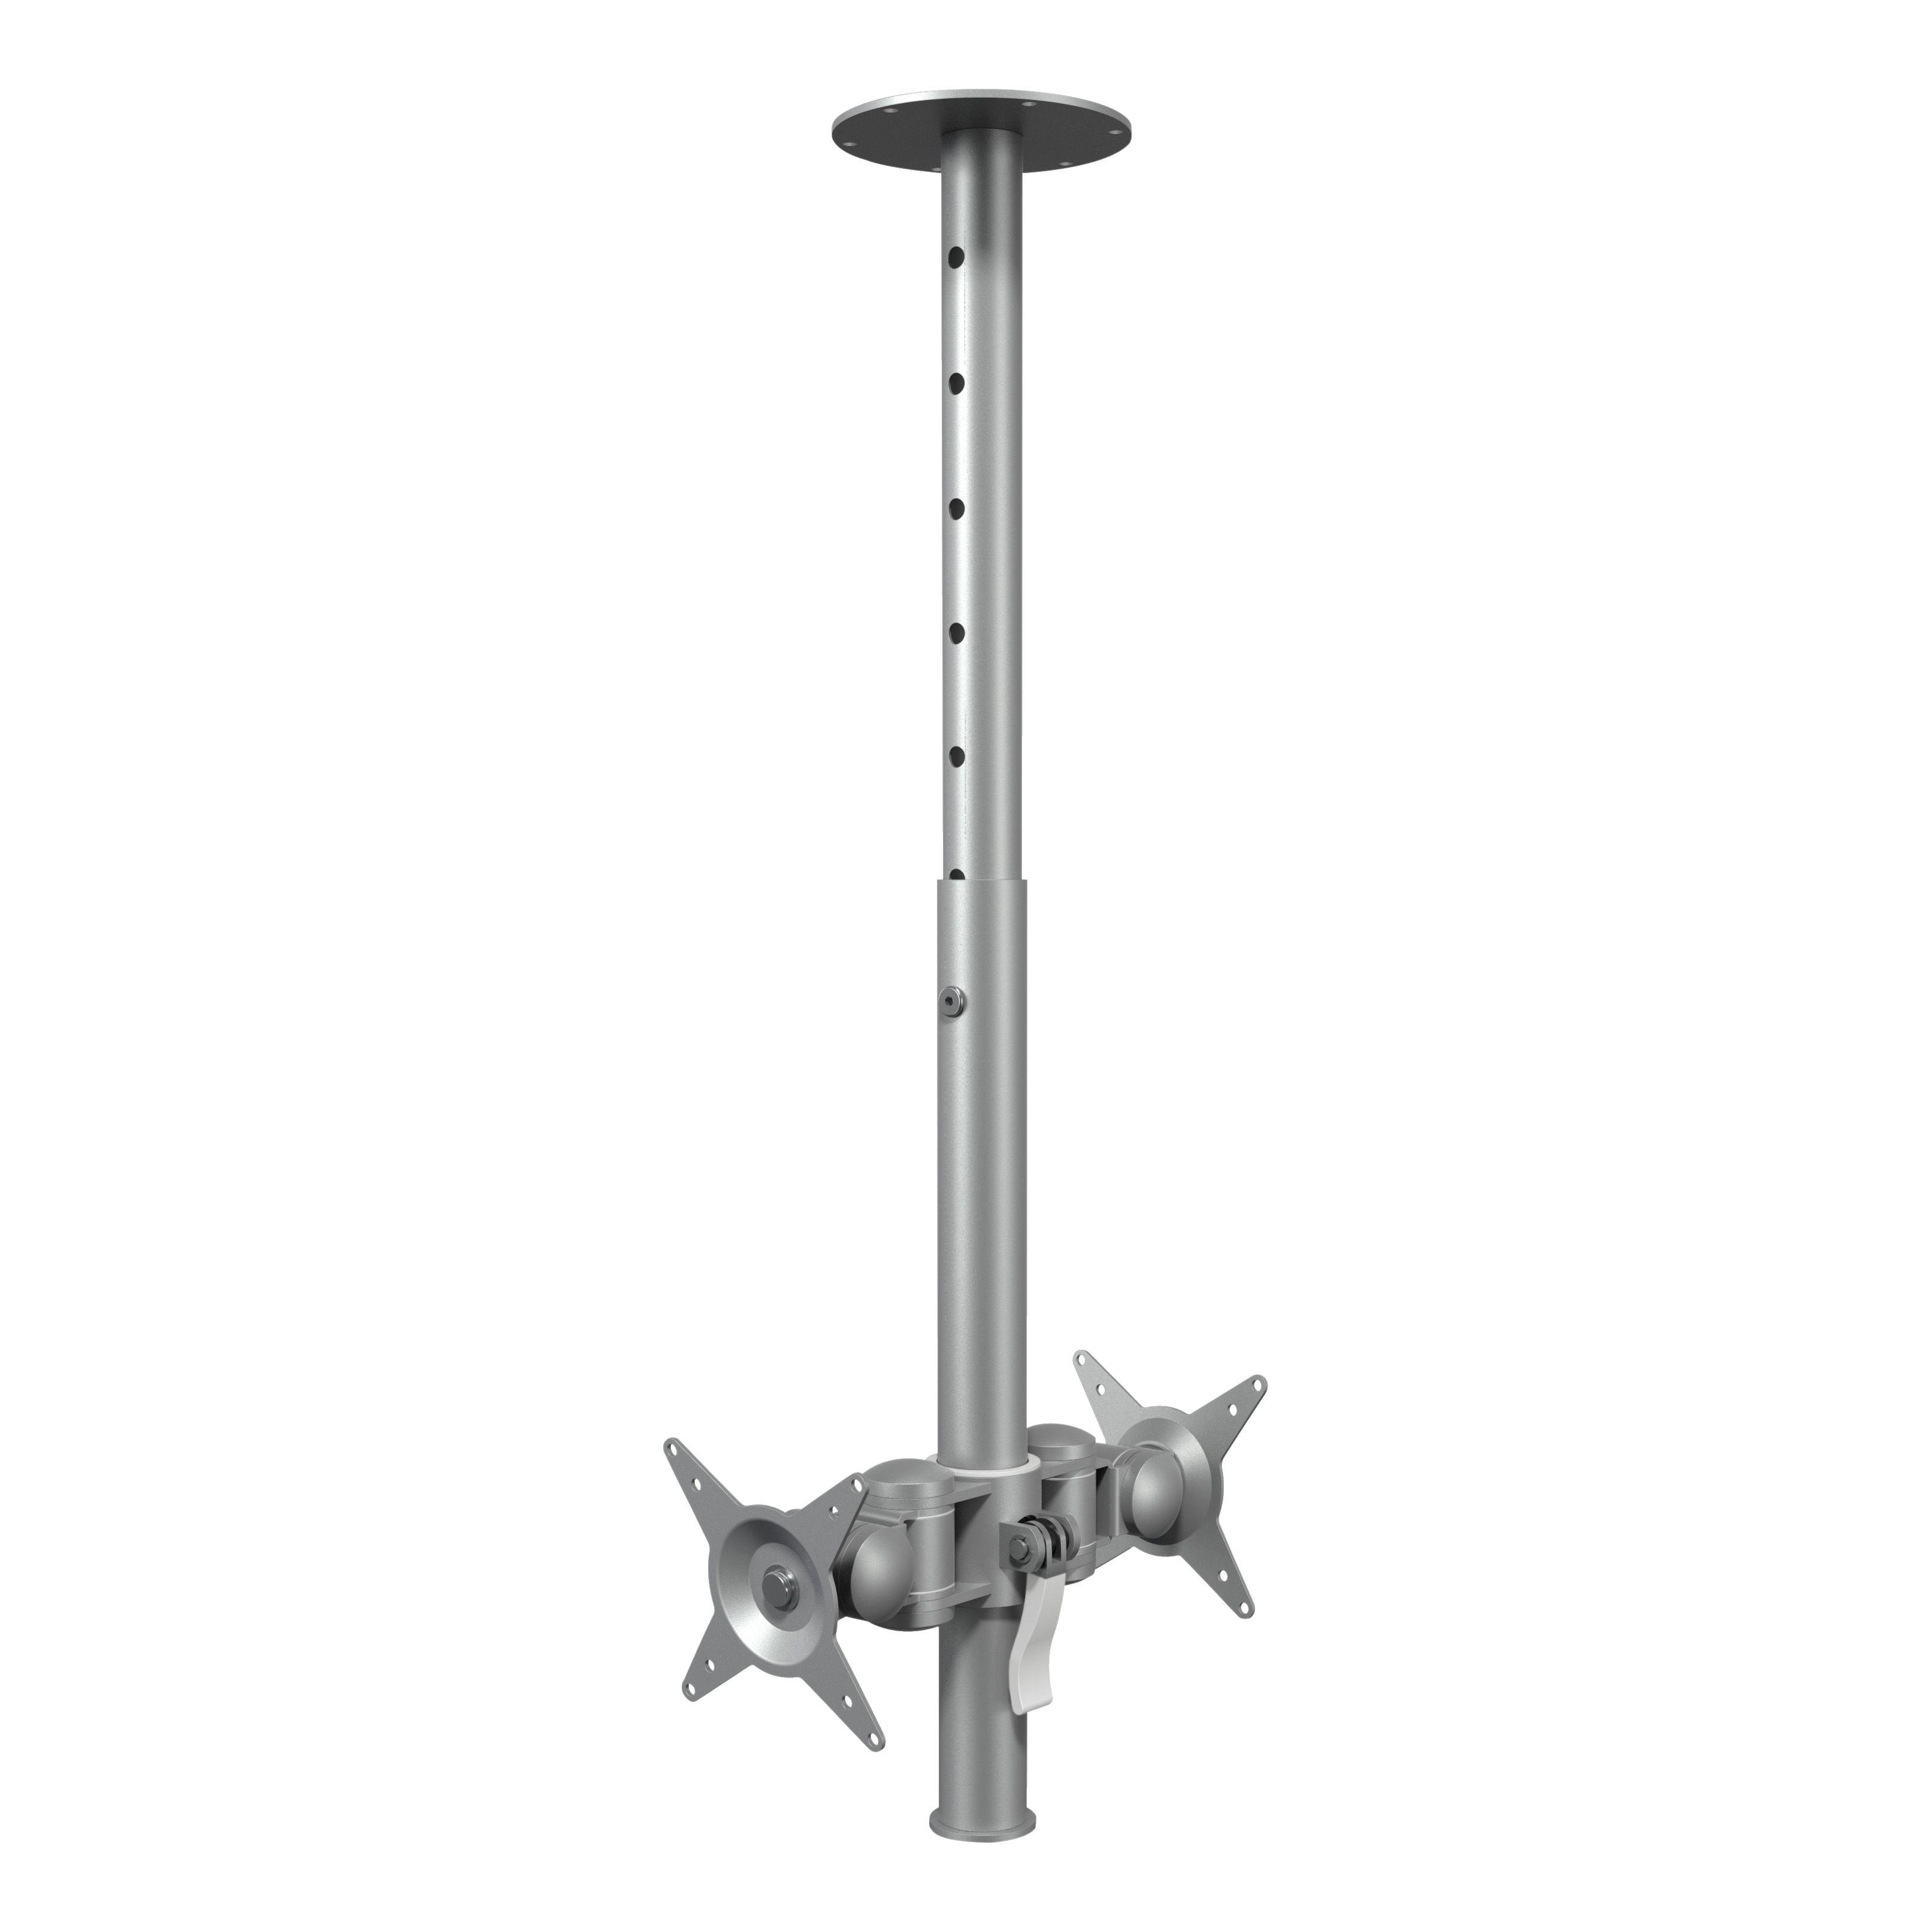 Tv-Loftbeslag Vipbar 30 kg